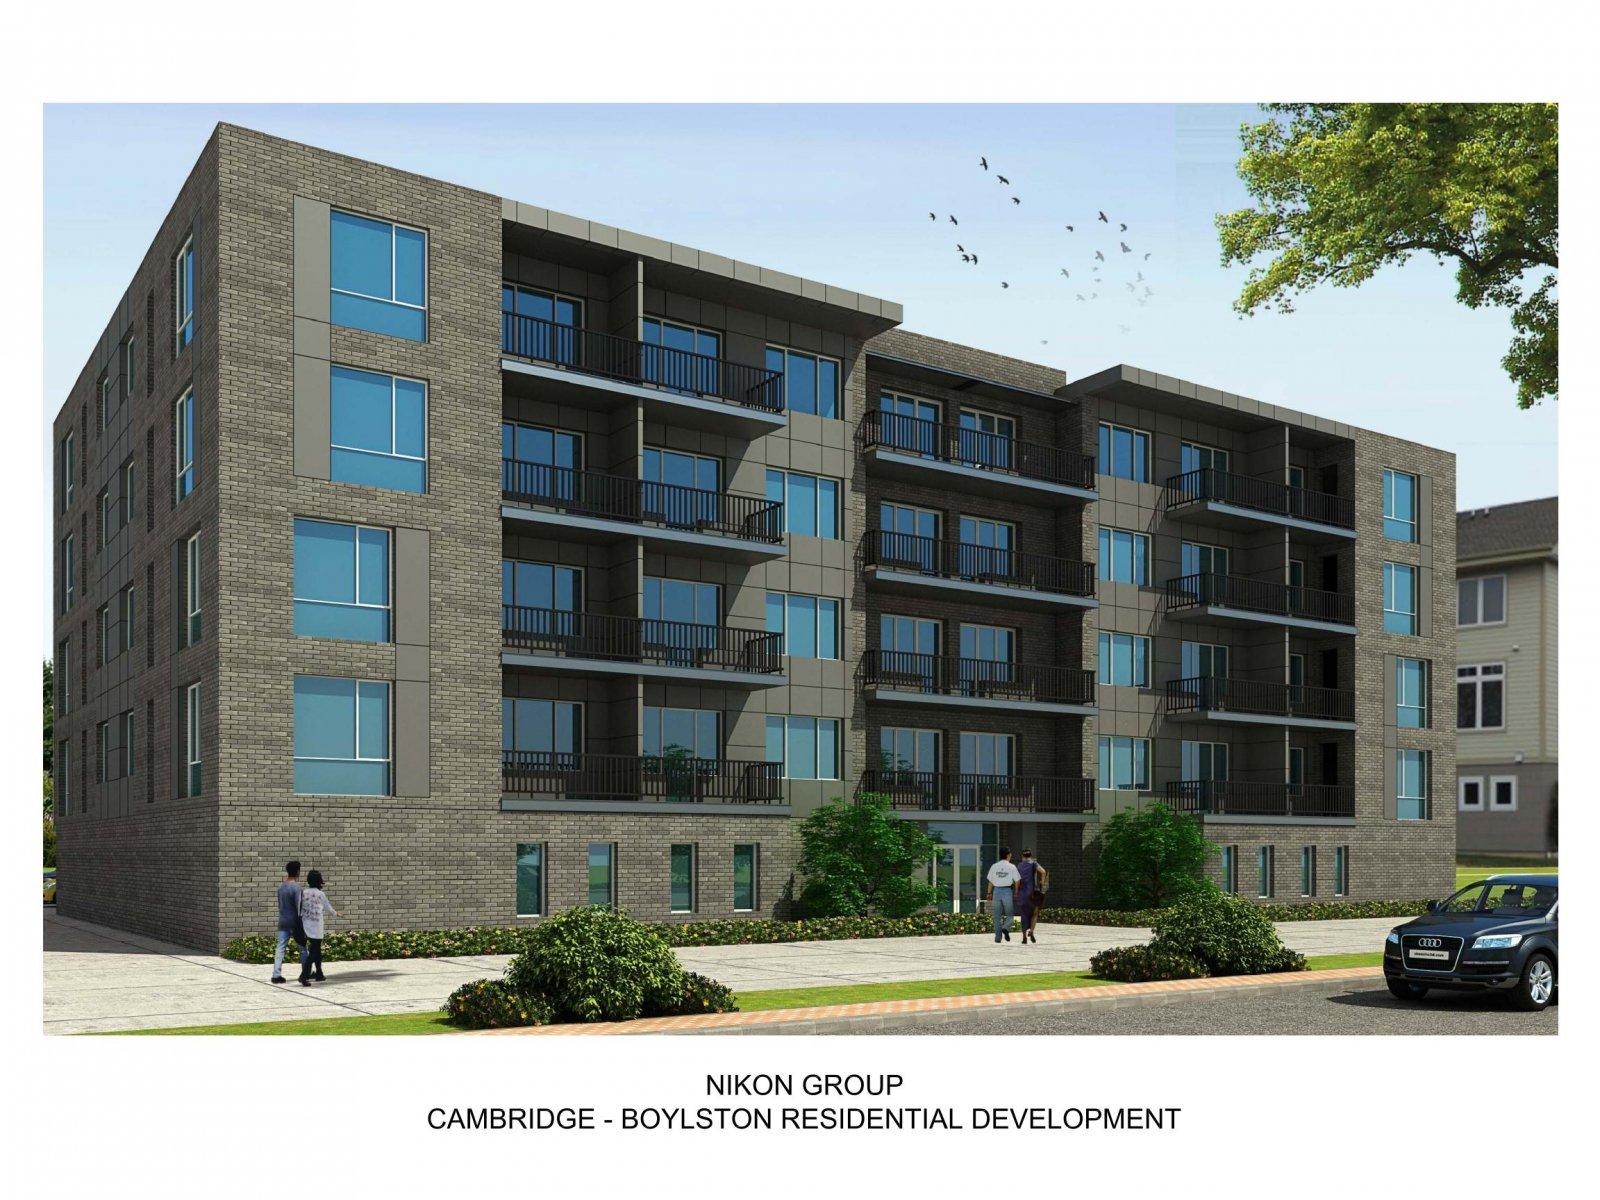 Cambridge - Boylston Residential Development Rendering